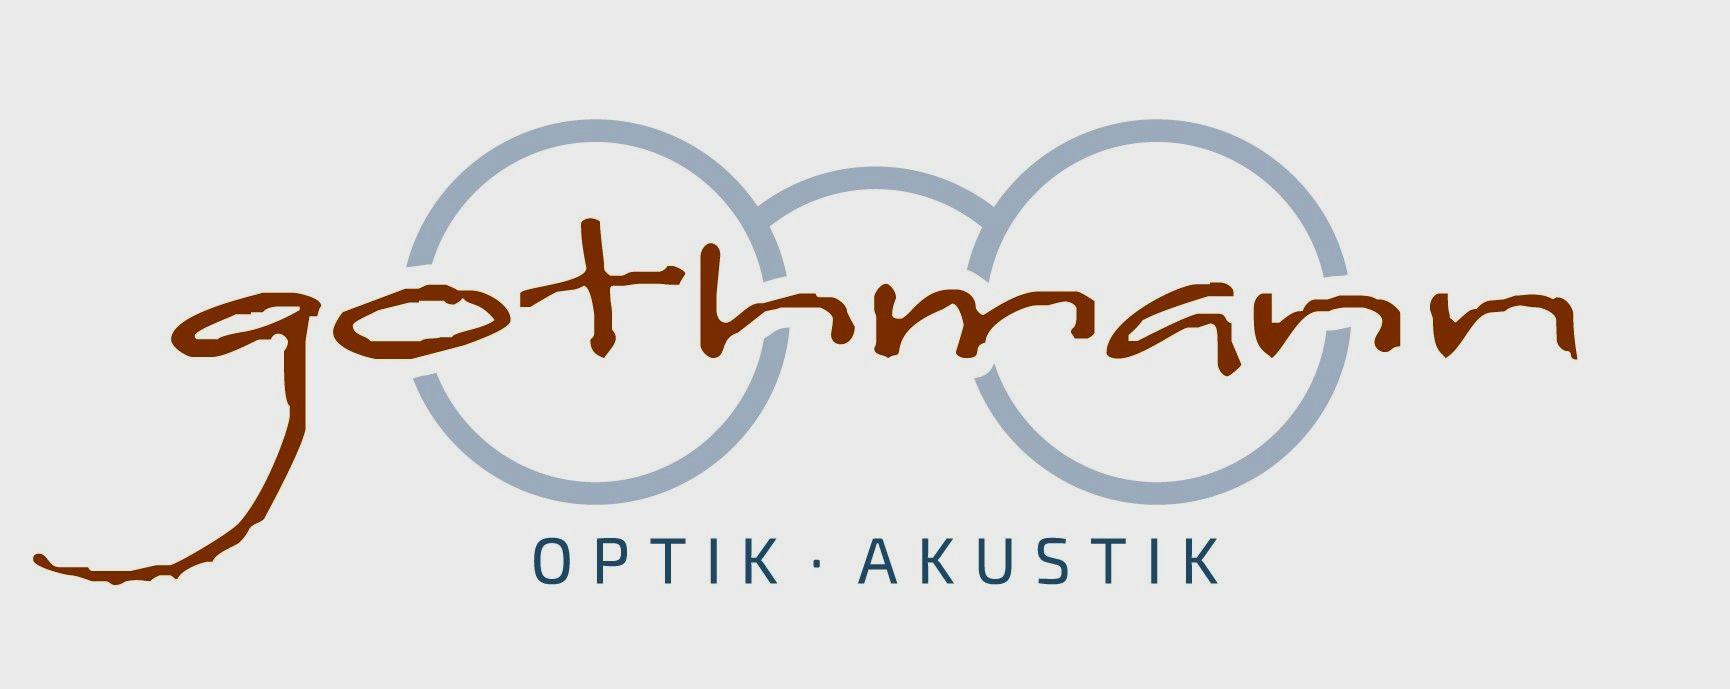 Gothmann Optik.Akustik